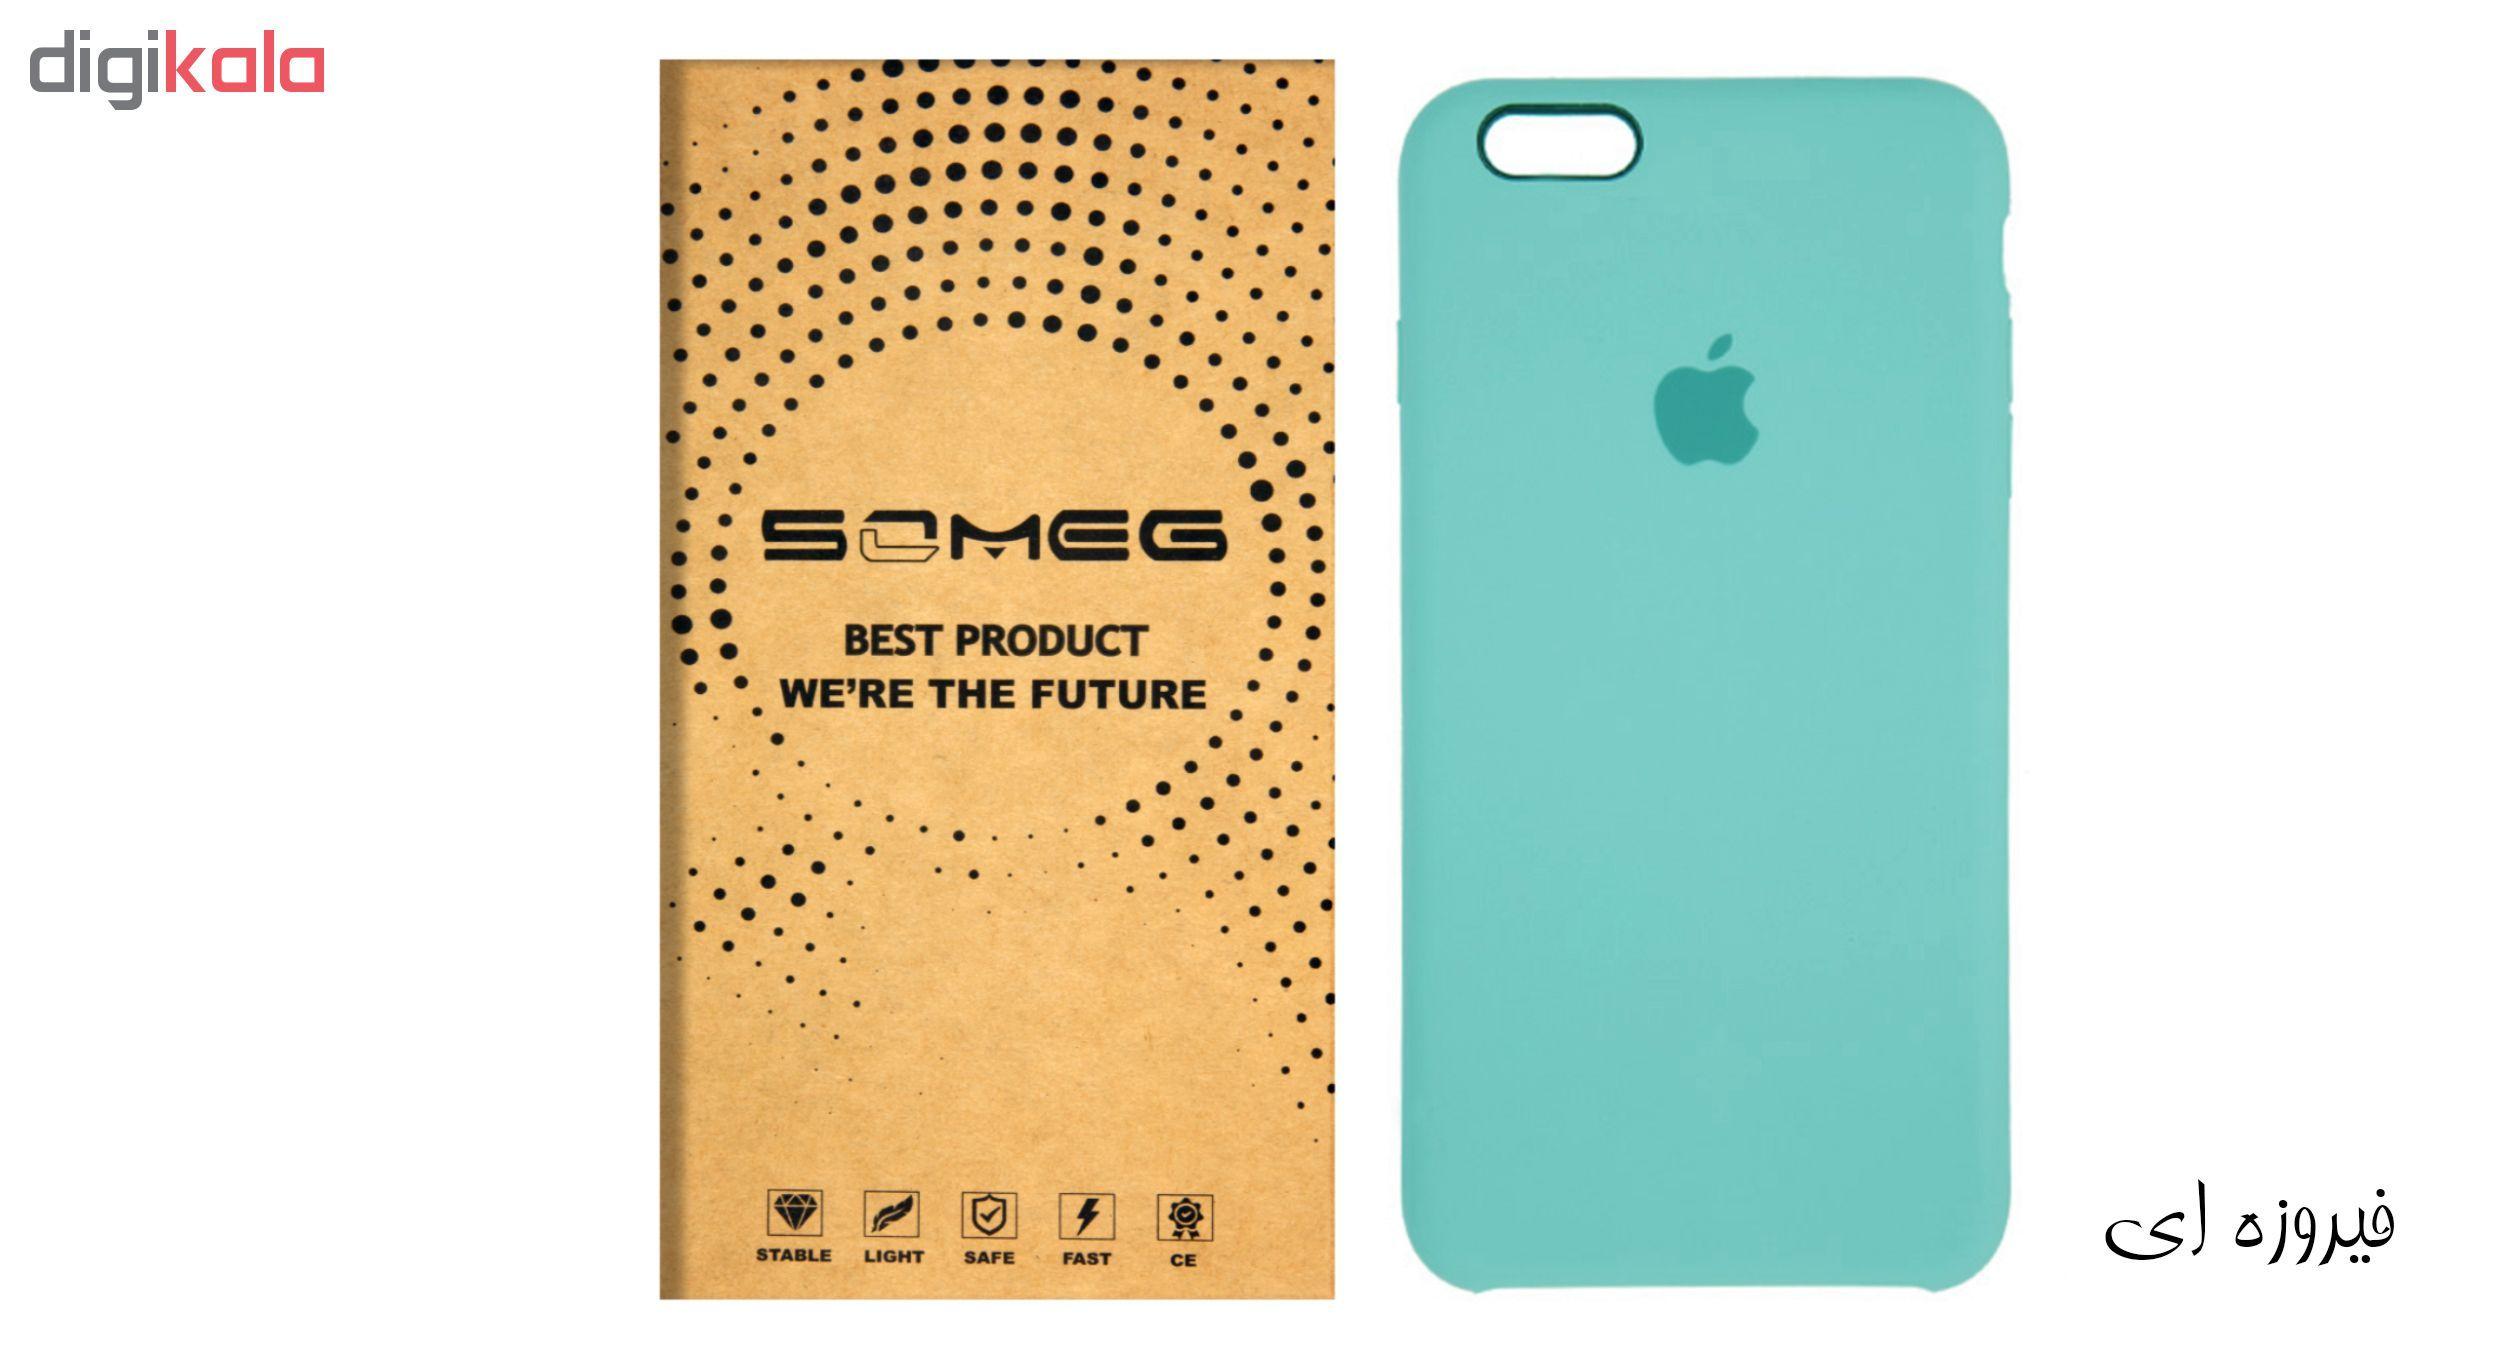 کاور سومگ مدل SIC مناسب برای گوشی موبایل اپل iPhone 6/6s main 1 11